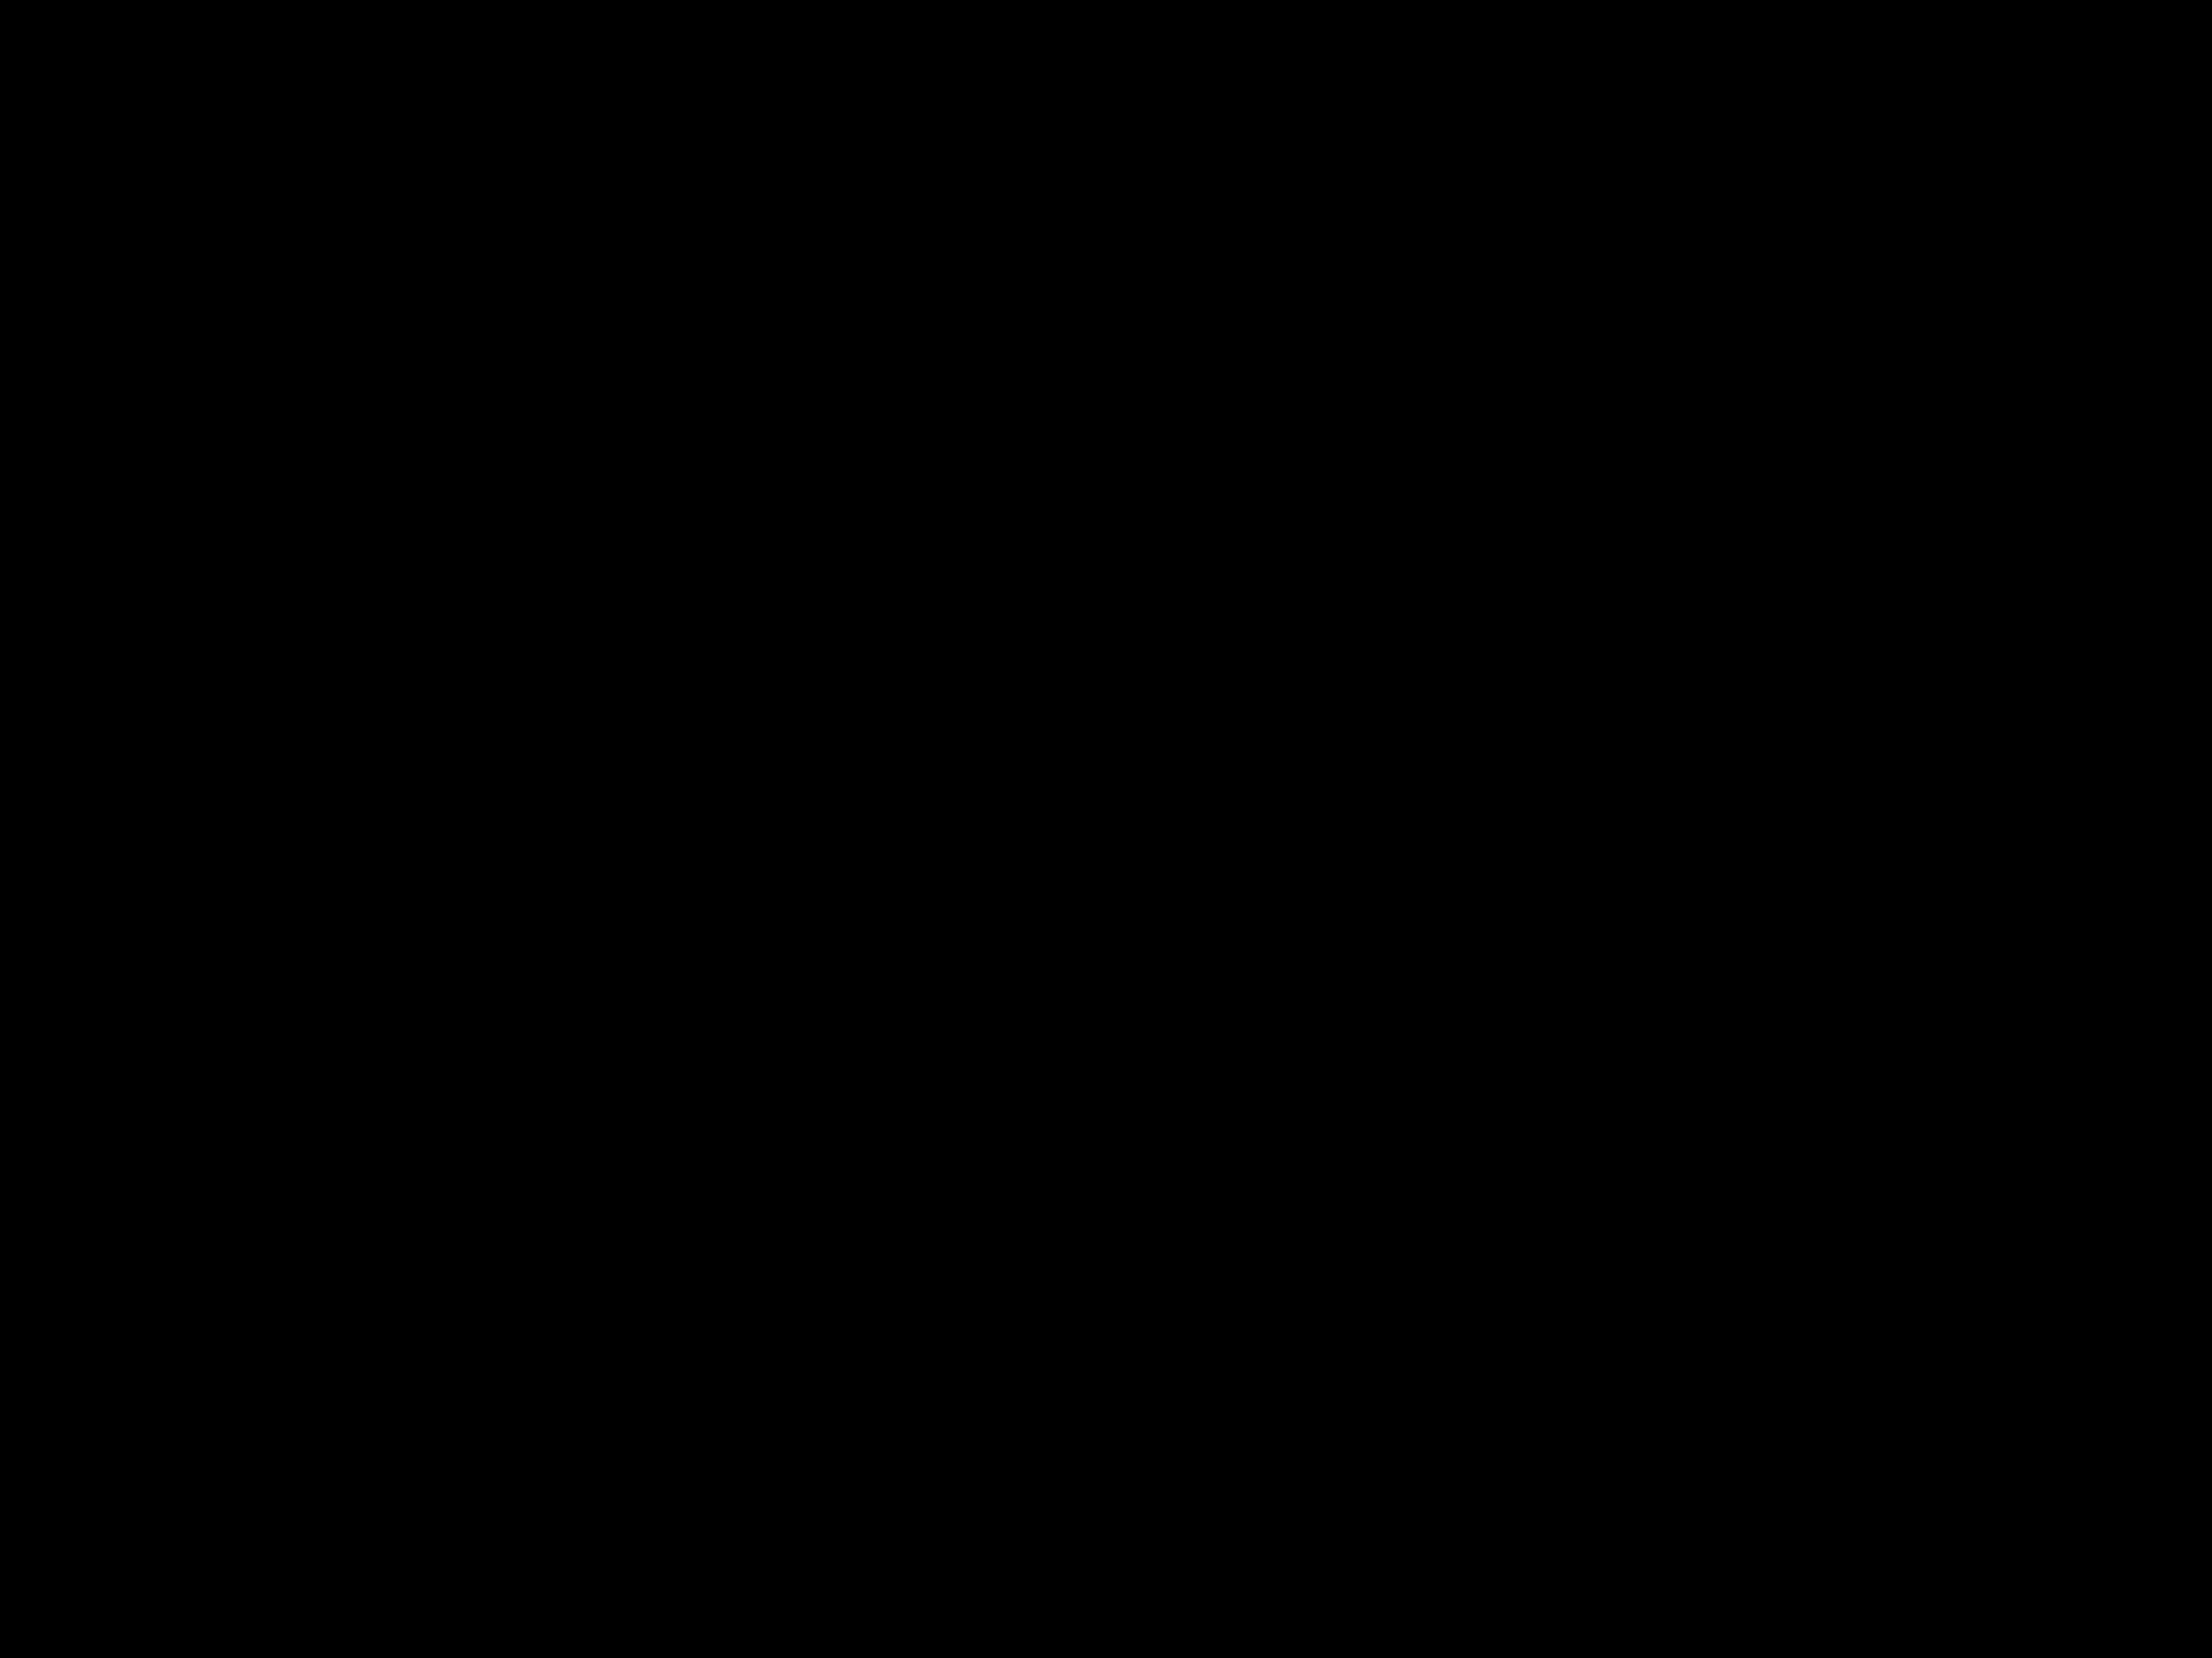 Hönnunarkeppnin Stíll